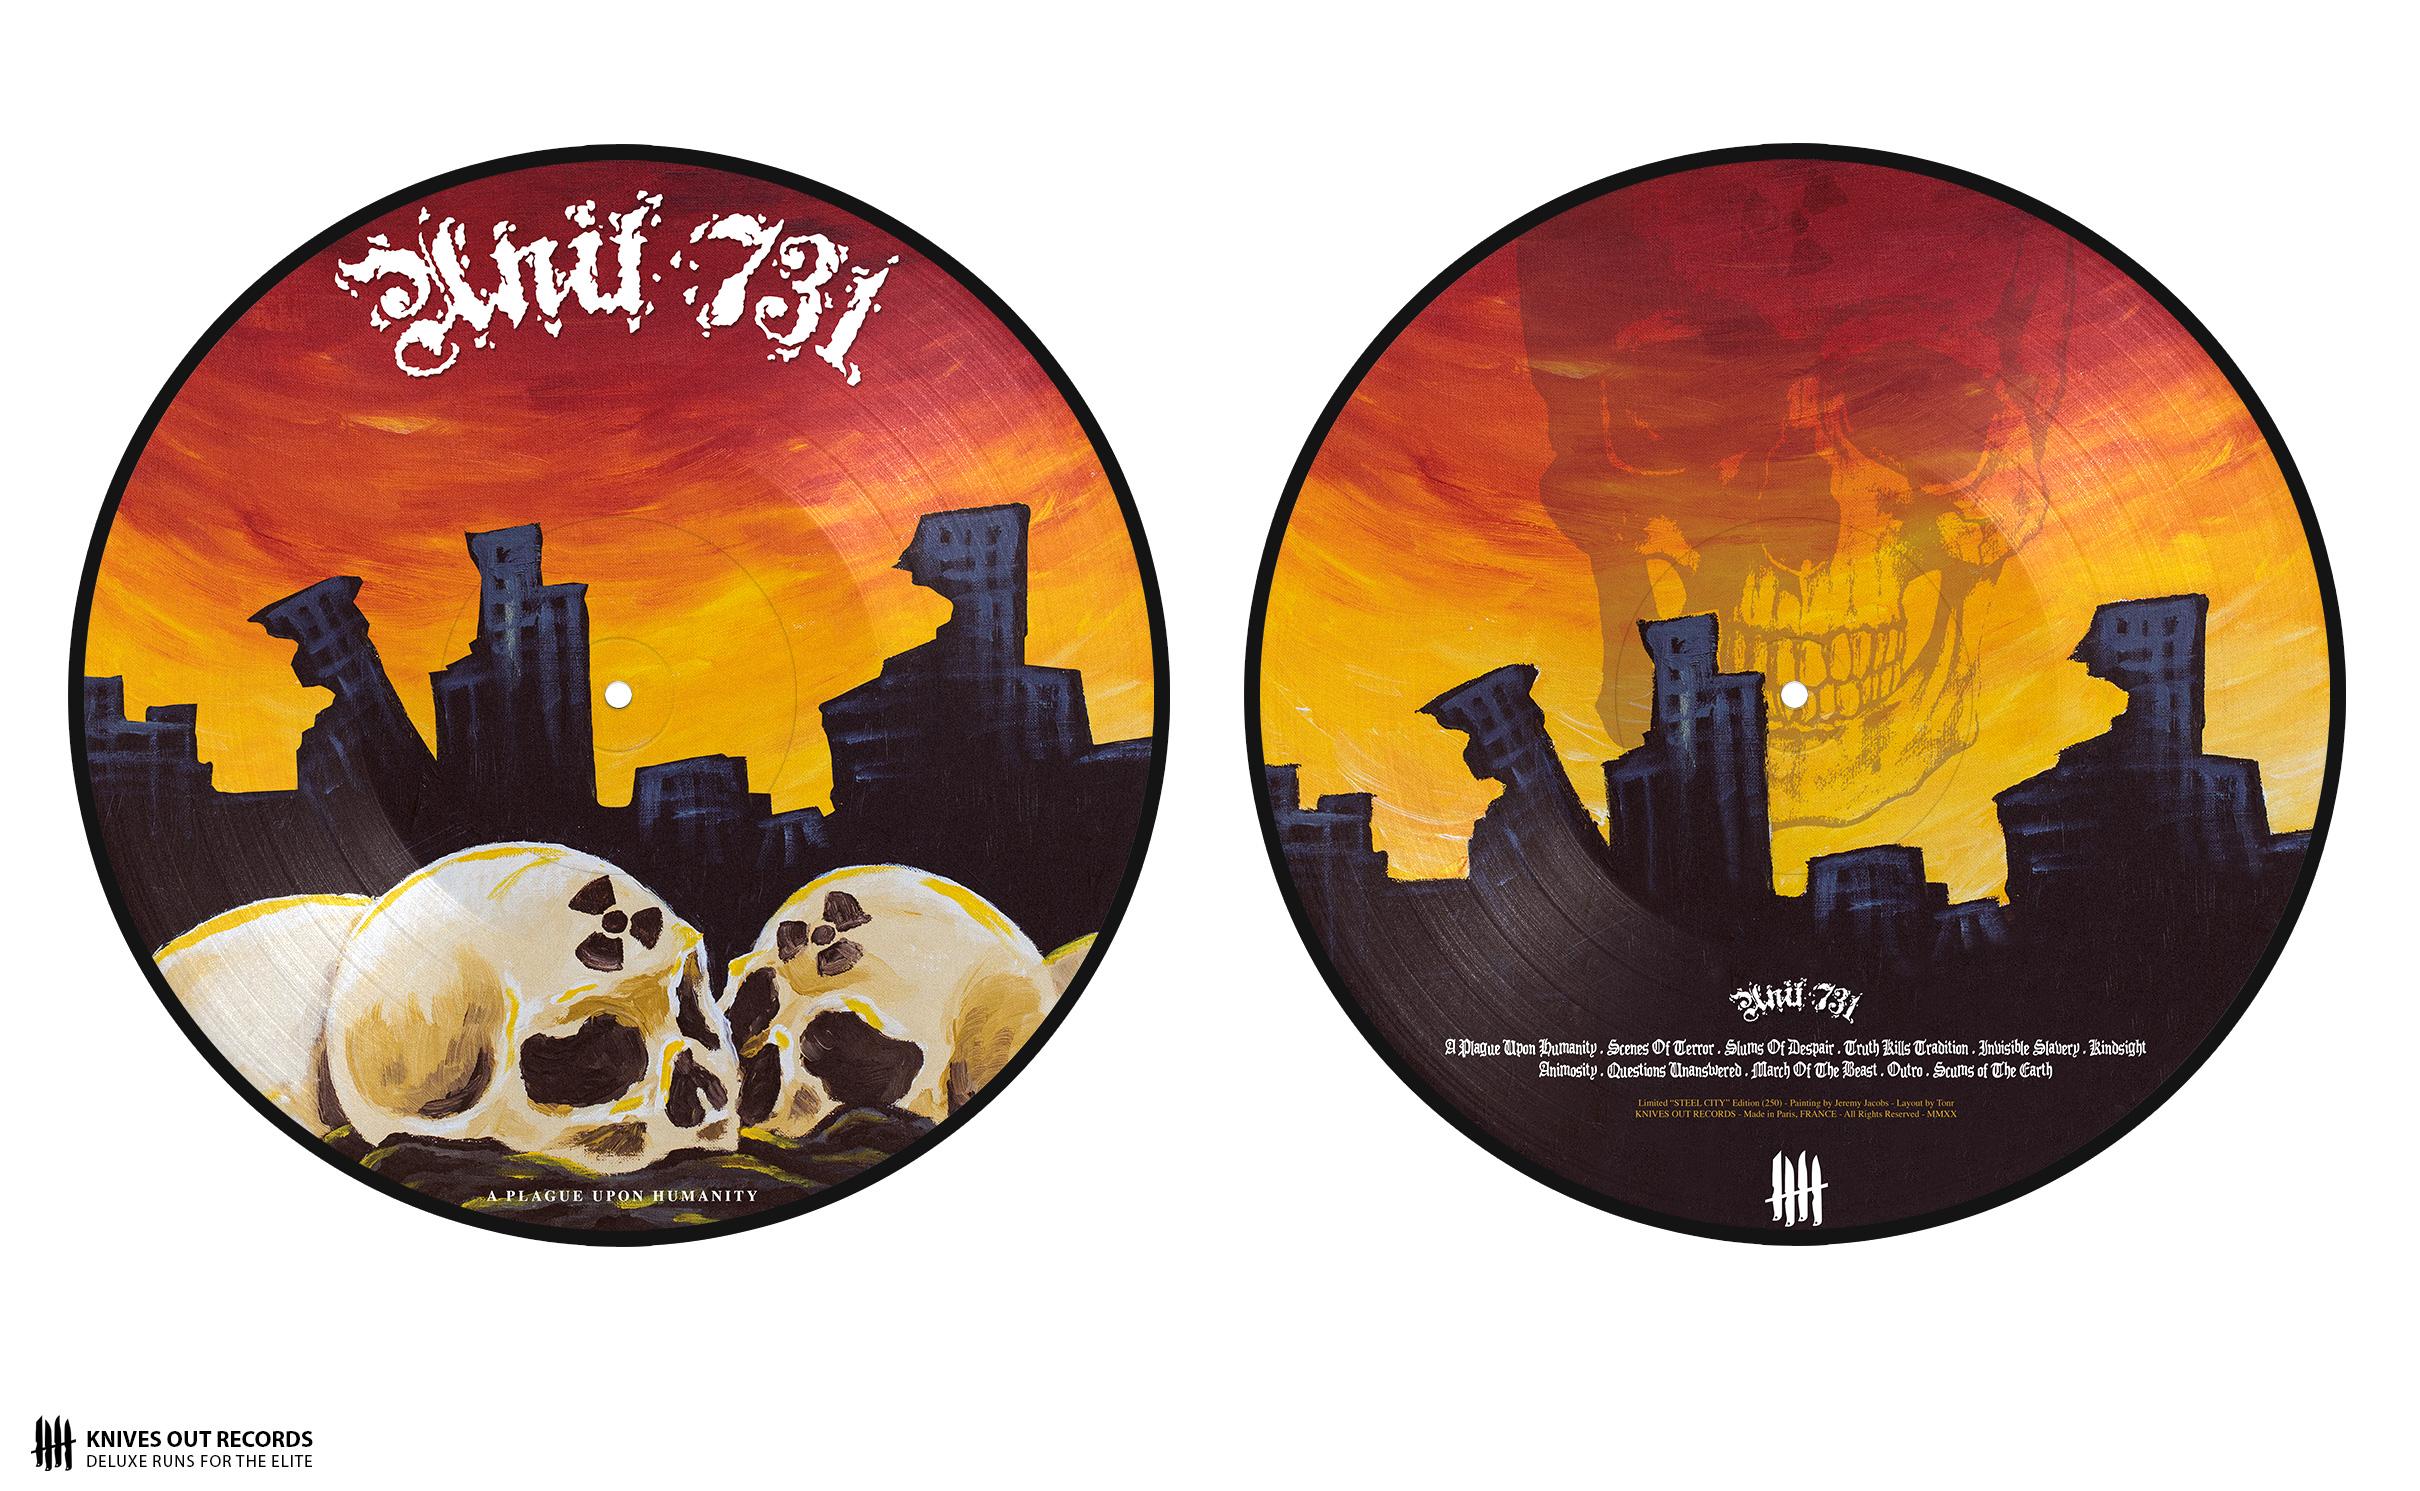 "UNIT 731 ""A Plague Upon Humanity"" Picture Disc 12"" Vinyl"